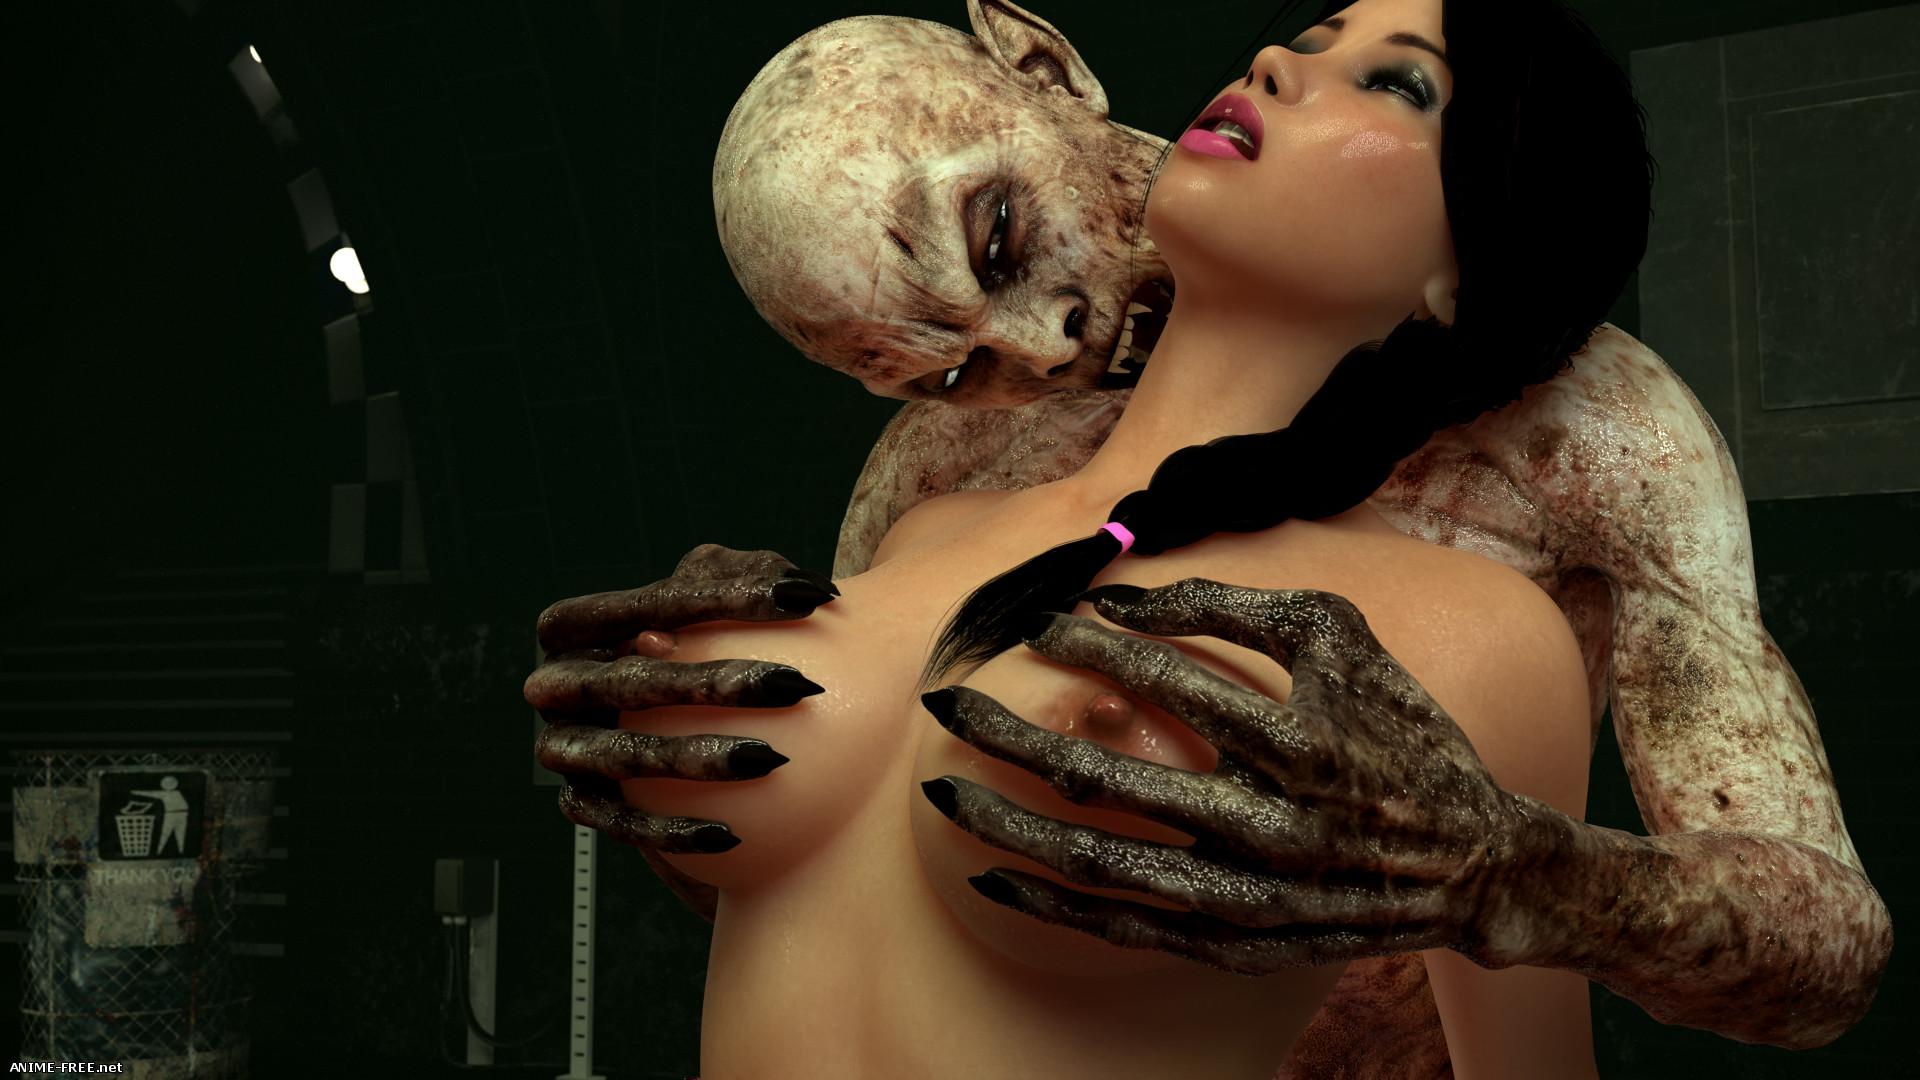 Night Trips II featuring Carina [3DCG] [Uncen] [ENG] Porn Comics